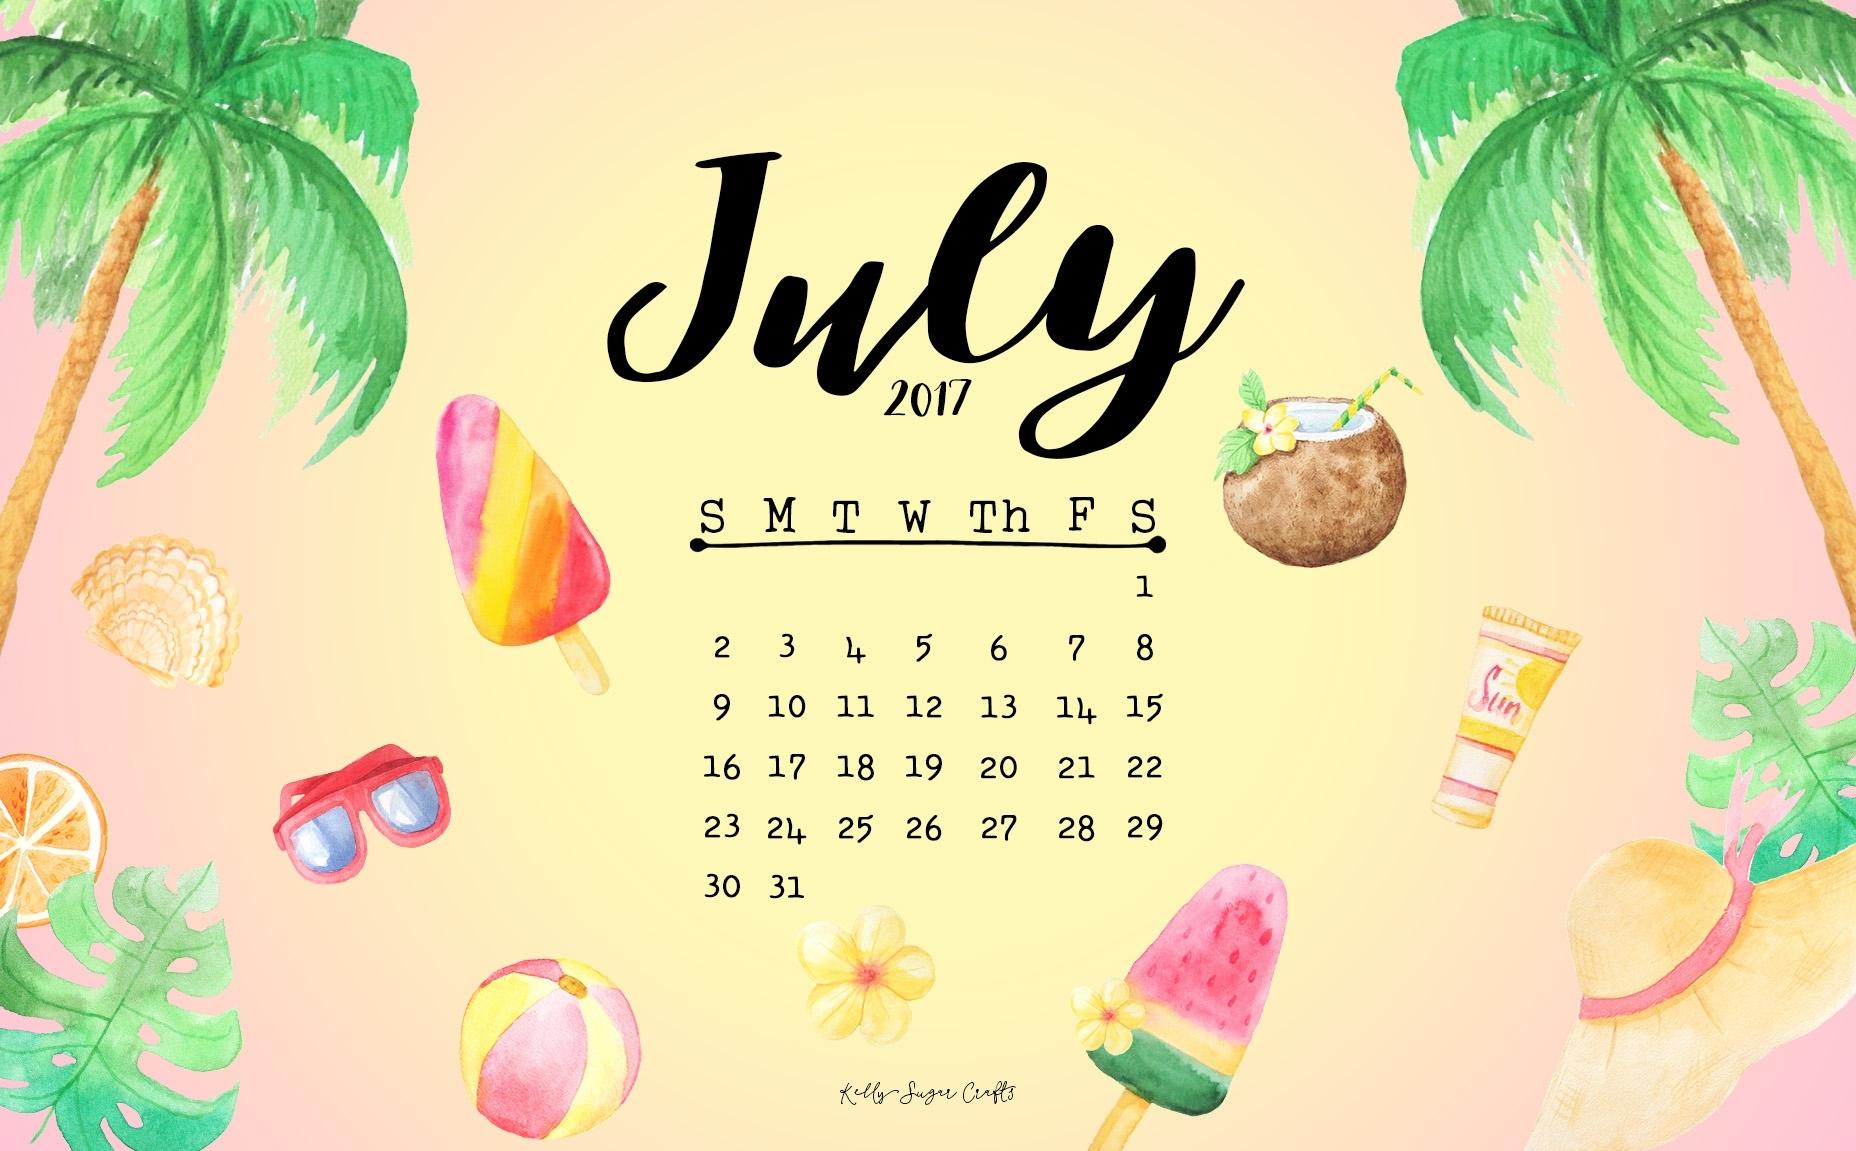 july 2017 calendar + wallpapers - kelly sugar crafts